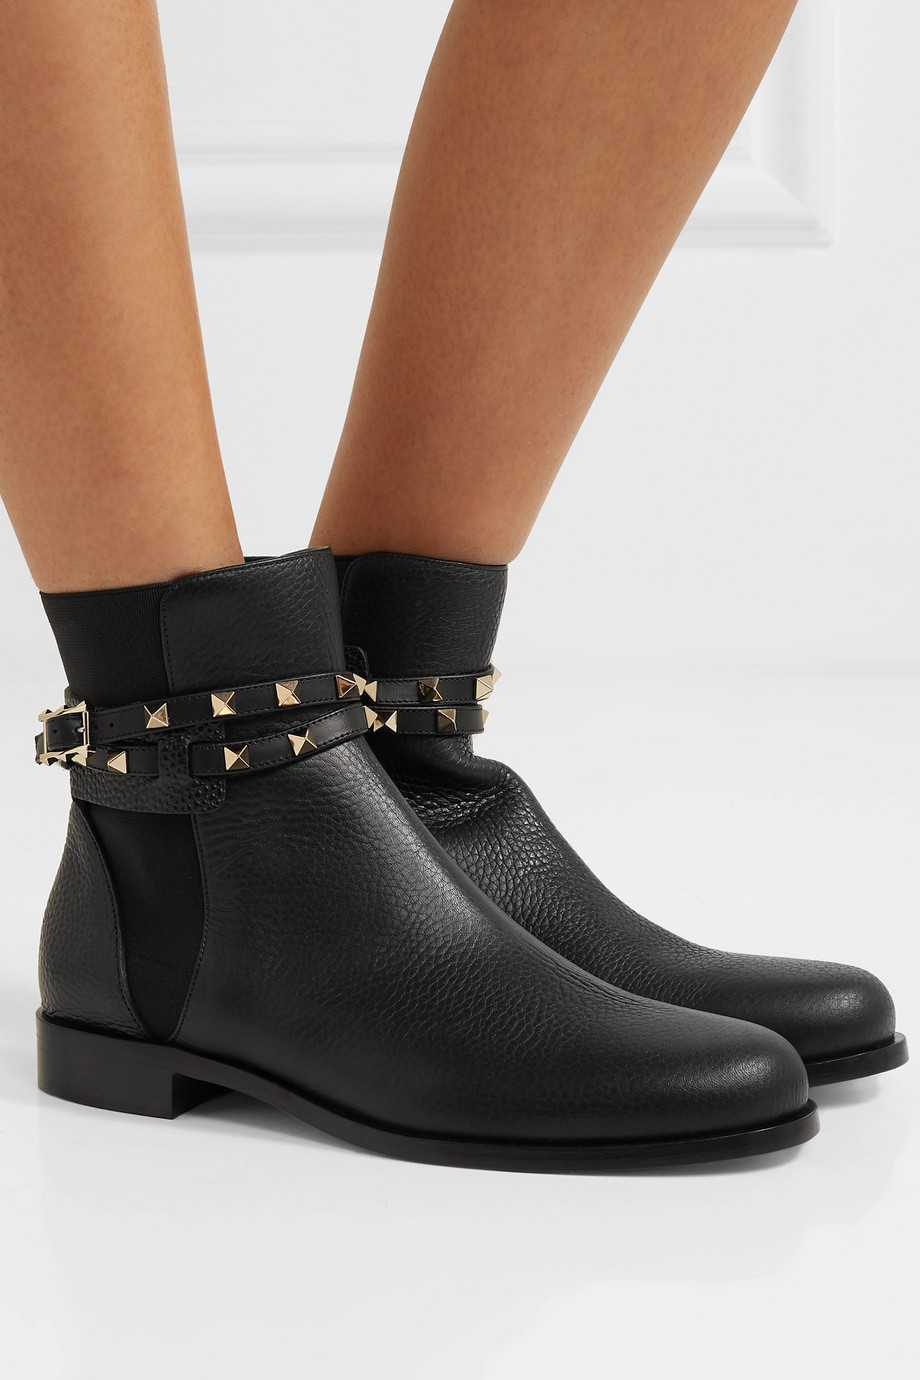 Valentino Valentino Garavani Rockstud textured-leather Chelsea boots